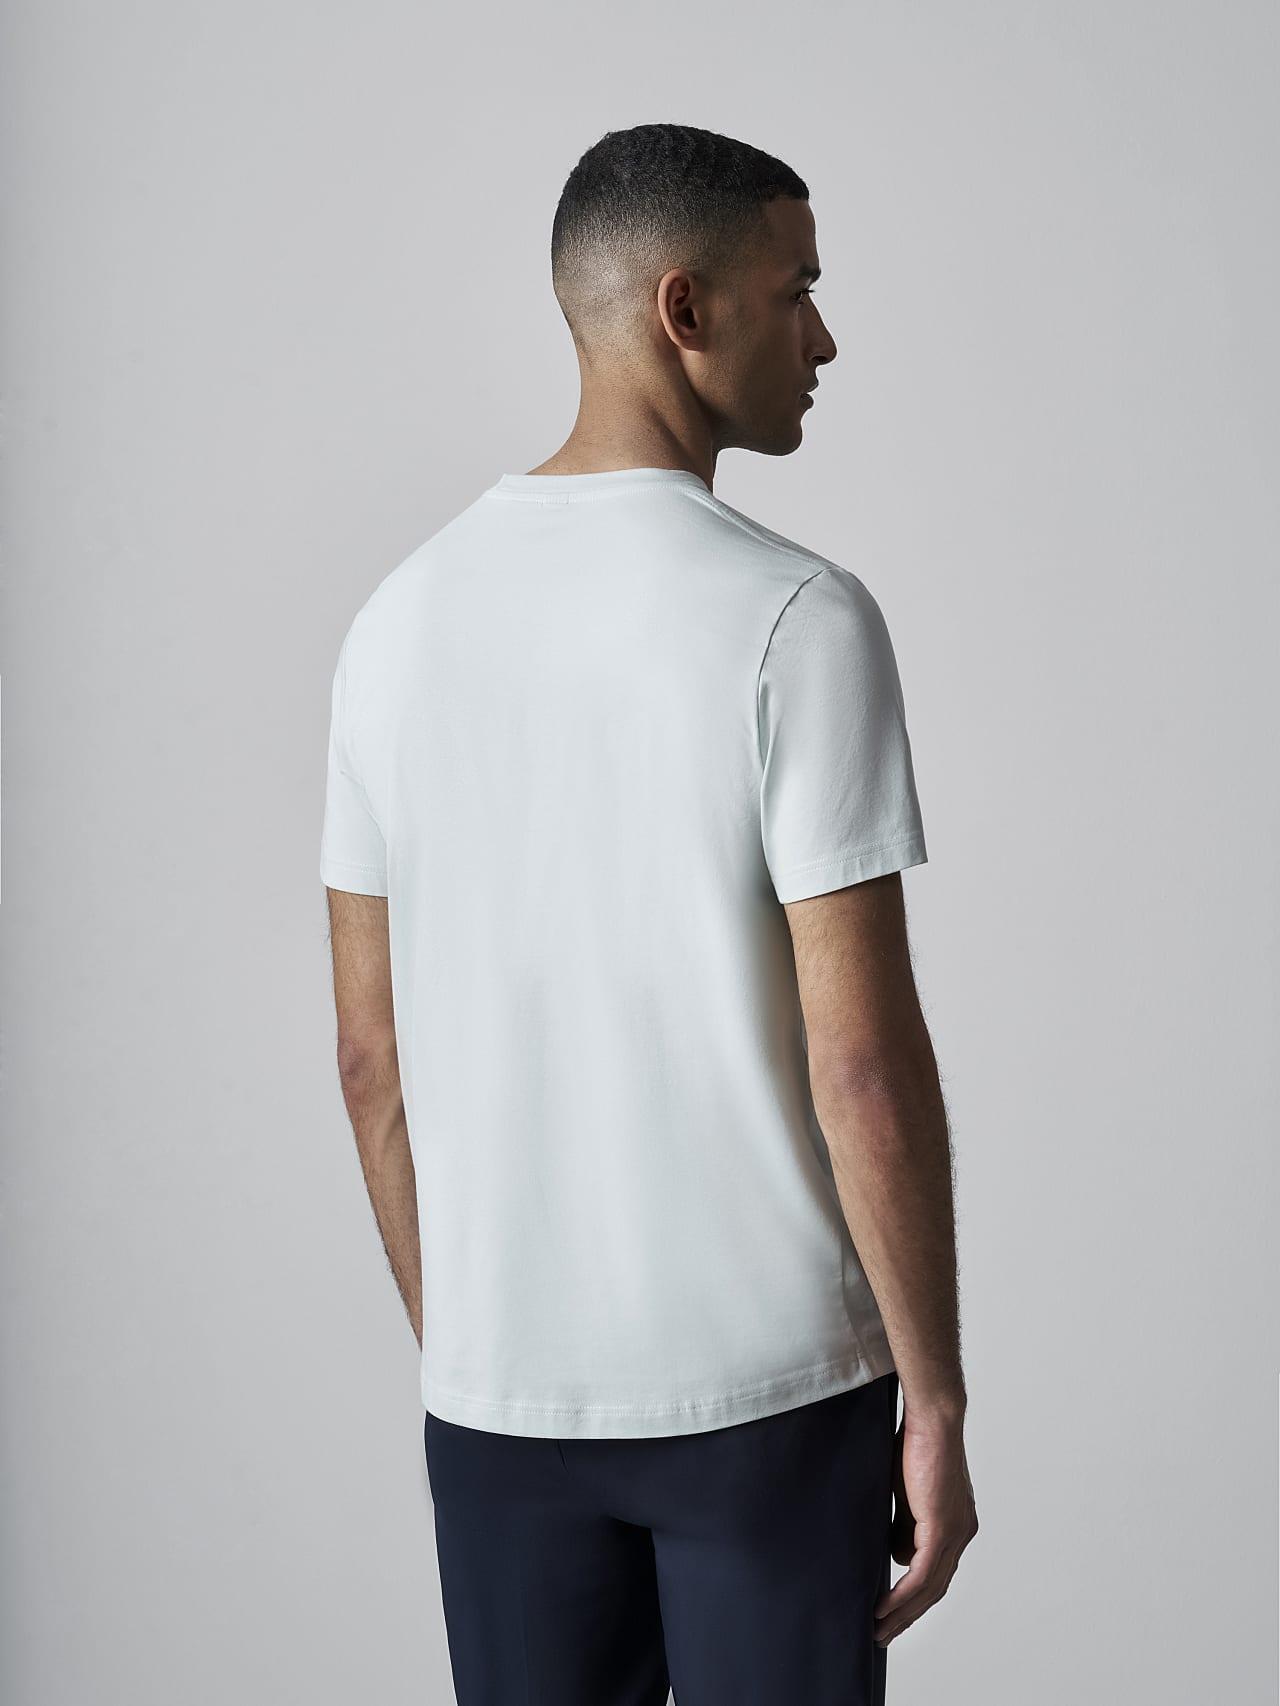 JABIS V1.Y5.02 Logo Print T-Shirt Pale Blue  Front Main Alpha Tauri